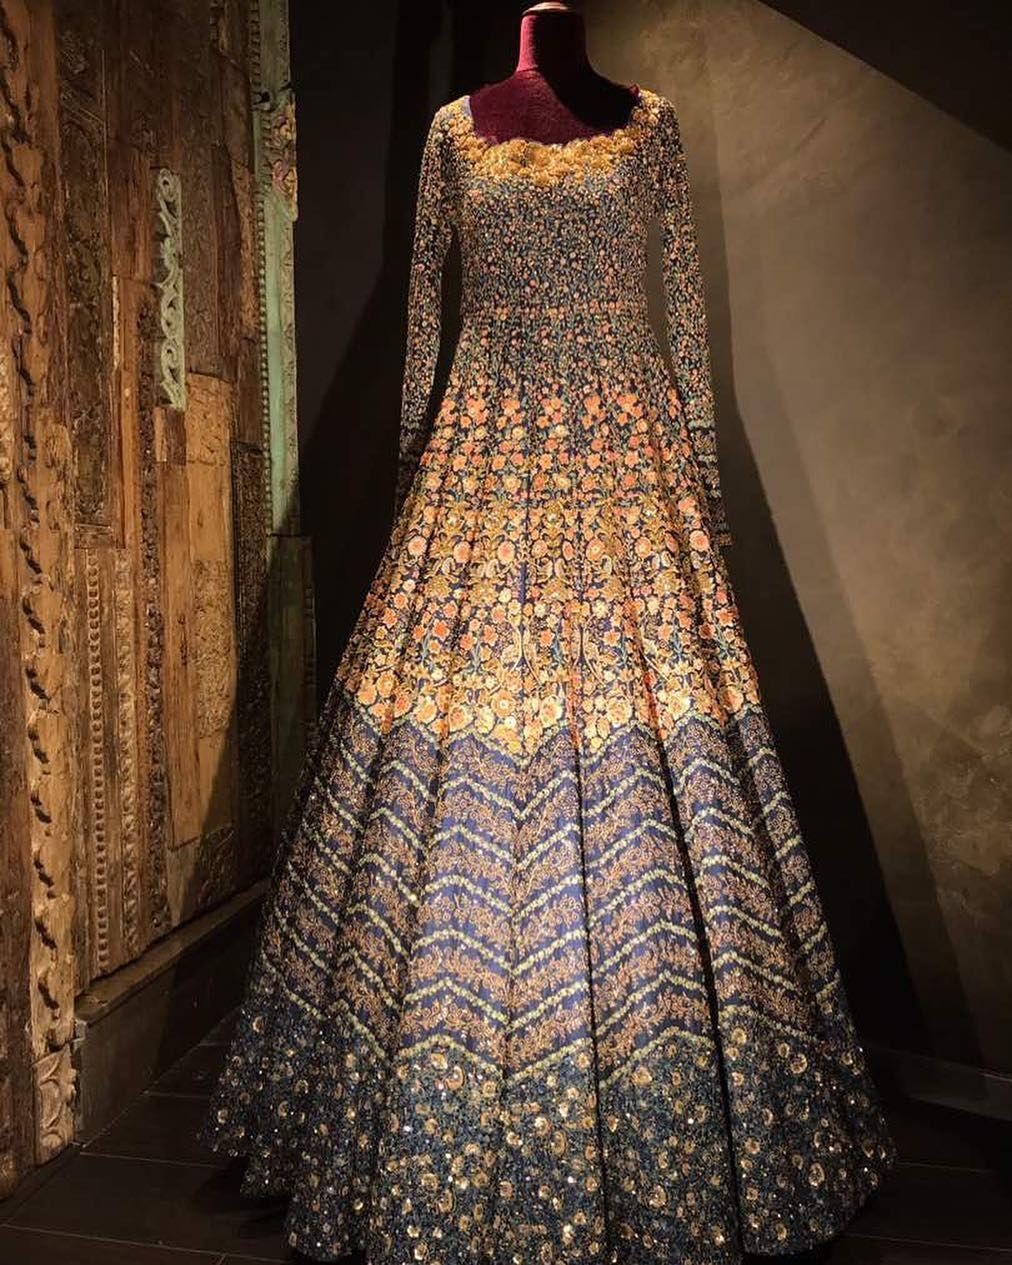 Pin by nayab musa on wedding inspirations pinterest wedding